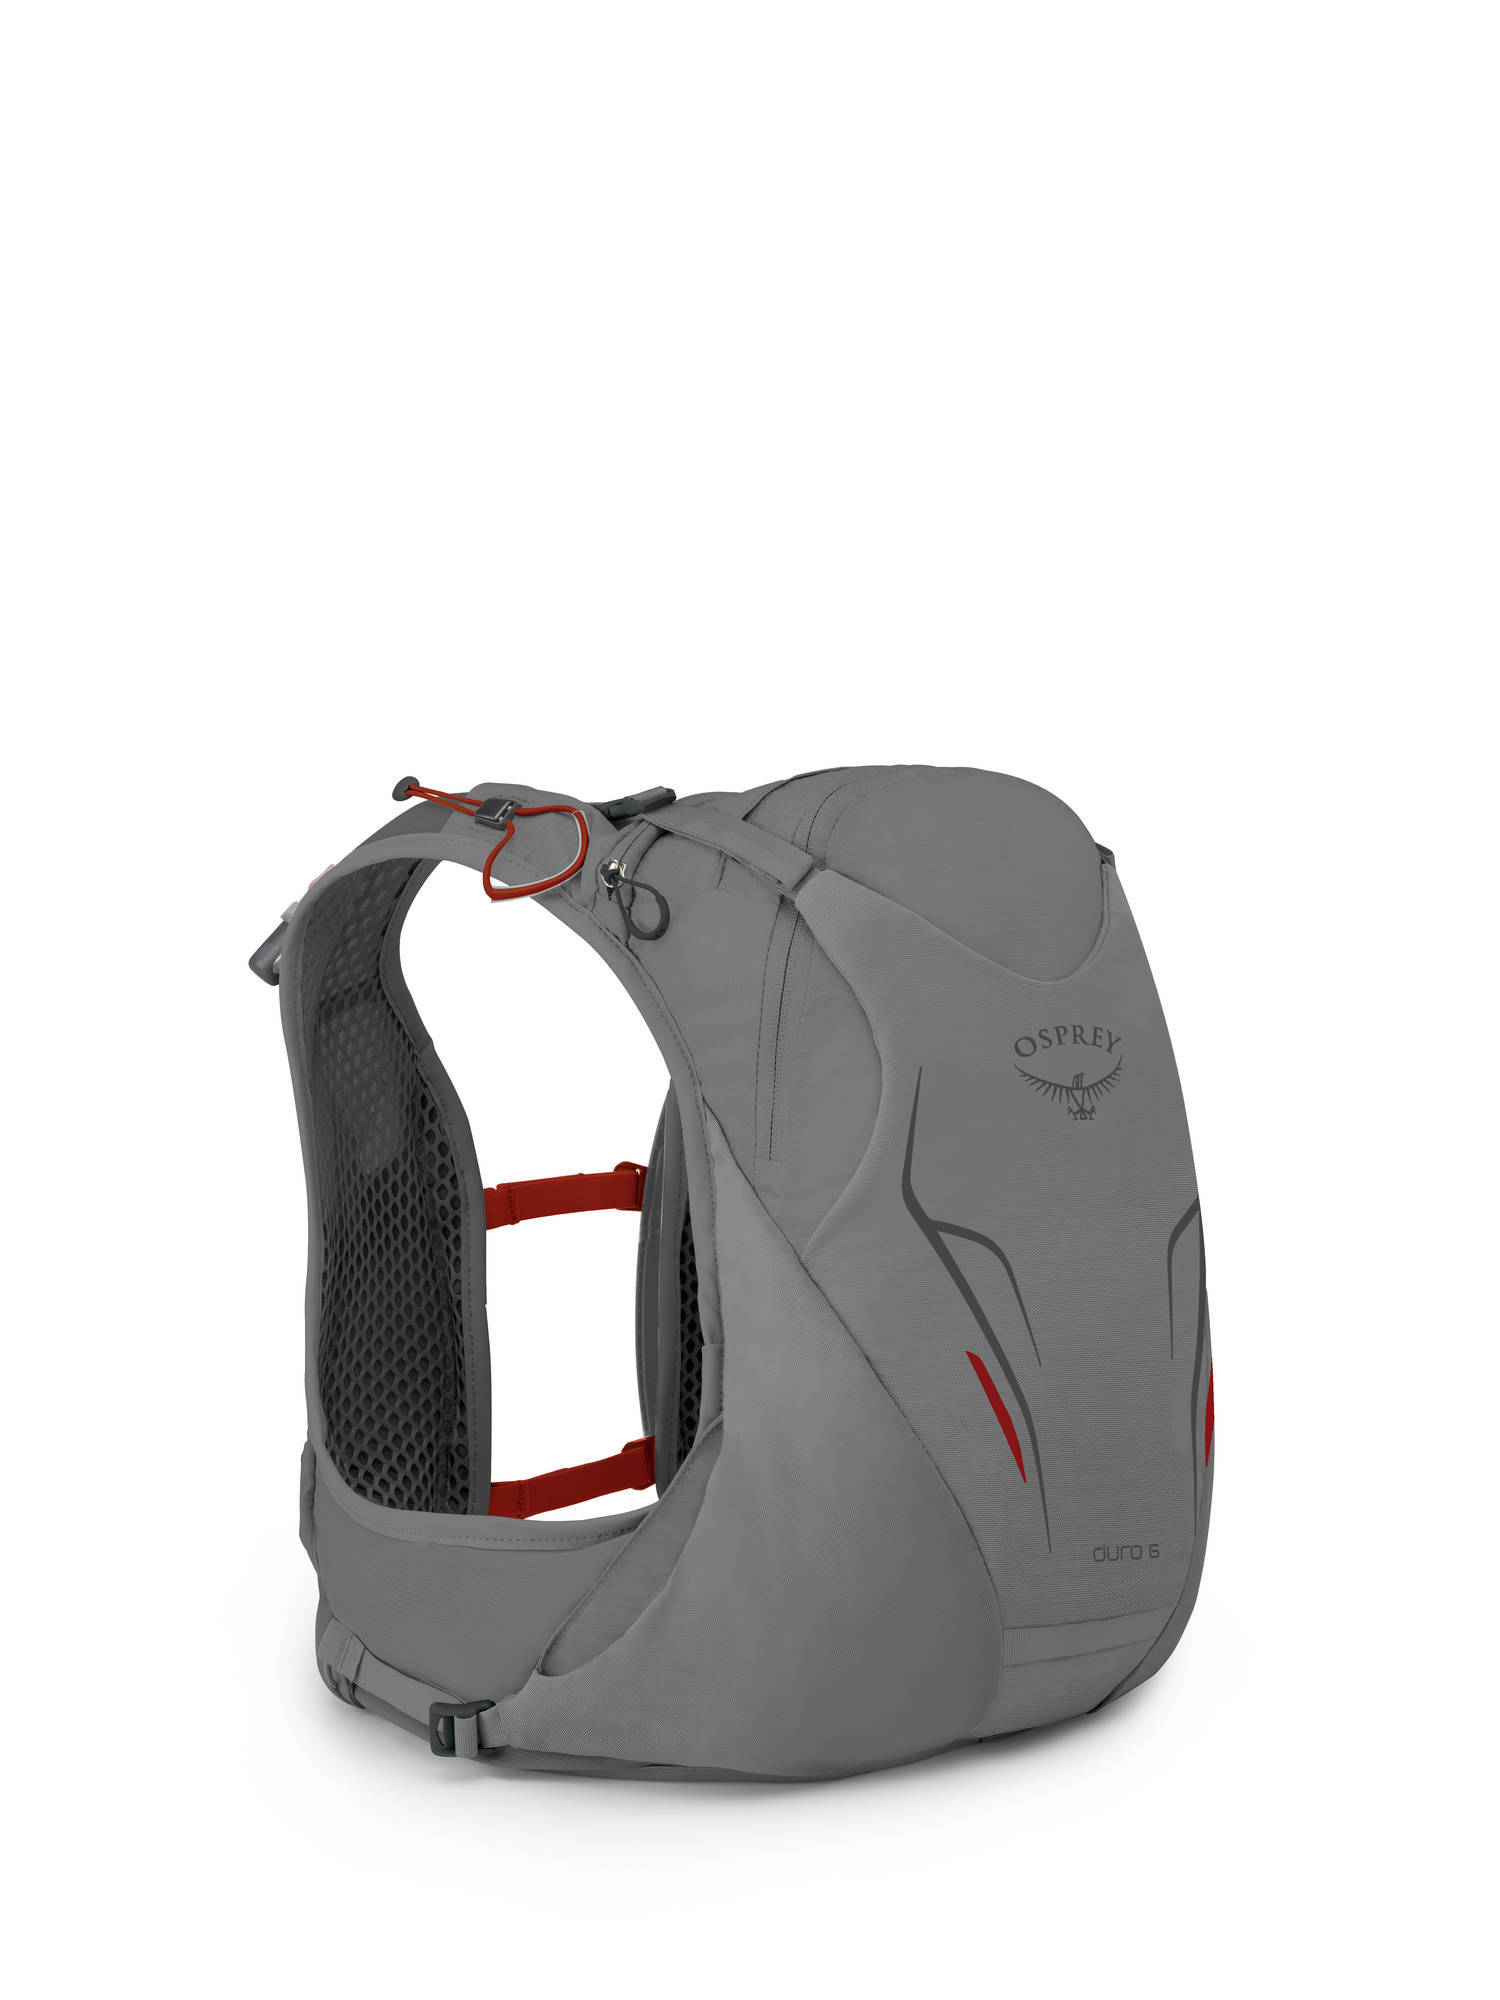 Рюкзаки для бега Рюкзак для бега Osprey Duro 6 Duro_6_S17_Side_Silver_Squall_web.jpg